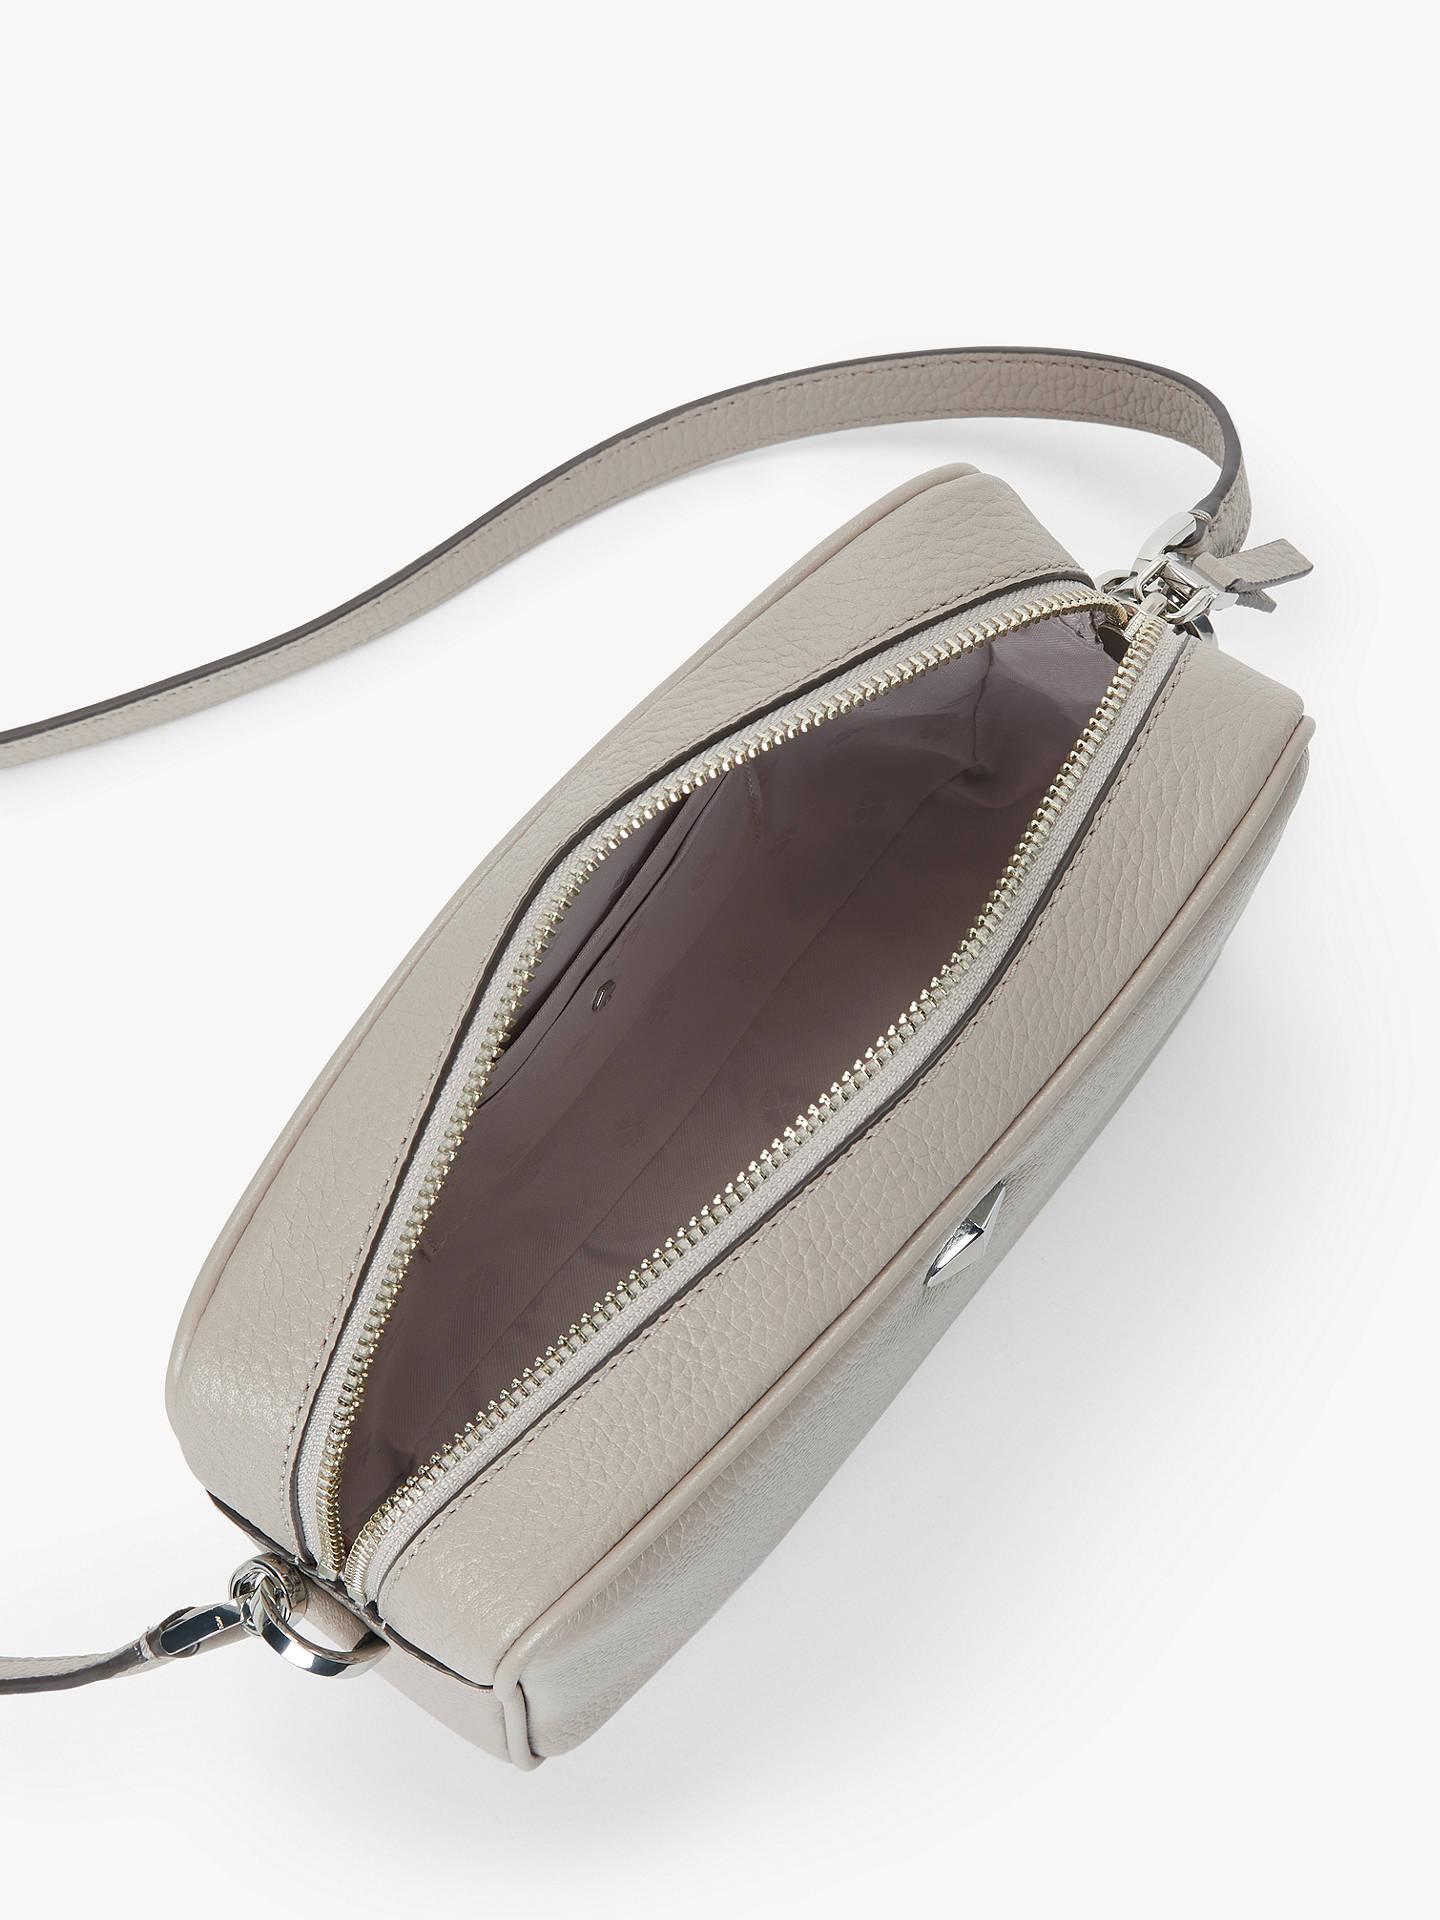 Kate Spade New York Polly Leather Medium Camera Bag Warm Taupe At John Lewis Partners